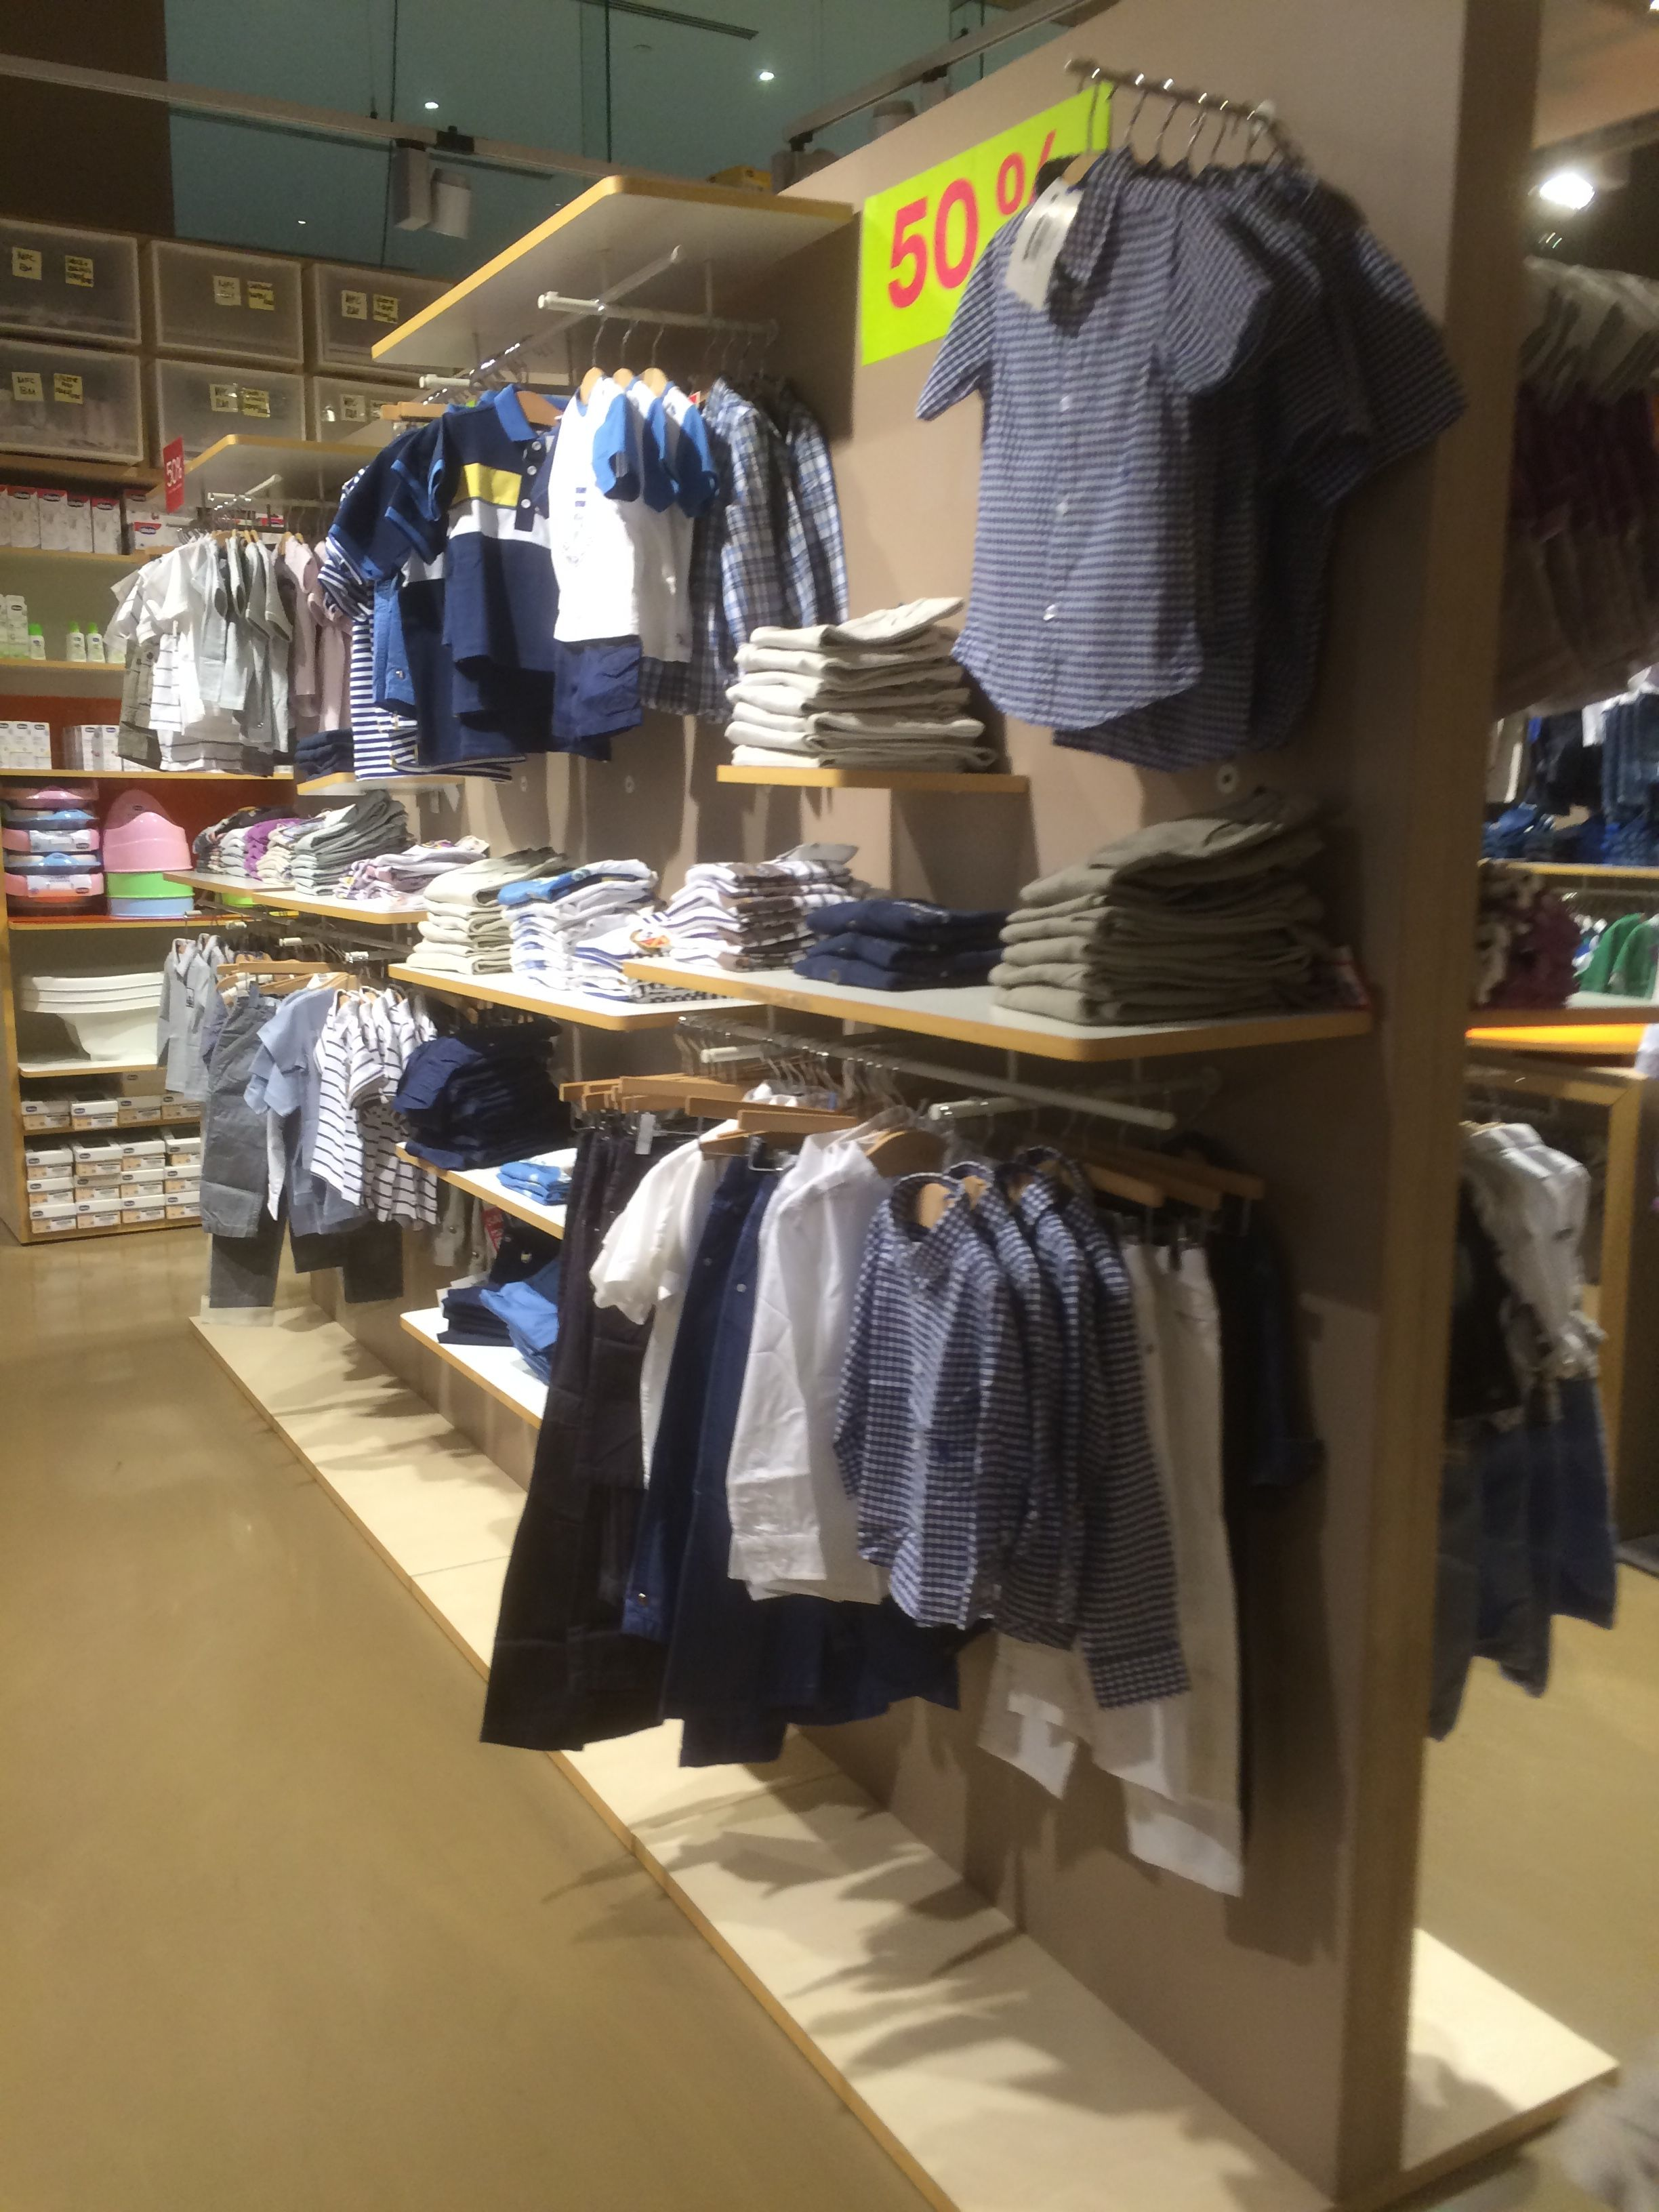 e61ef59df8c46 Chicco - UAE - Dubai Mall - Dubai - Baby - Layout - Landscape - Lifestyle